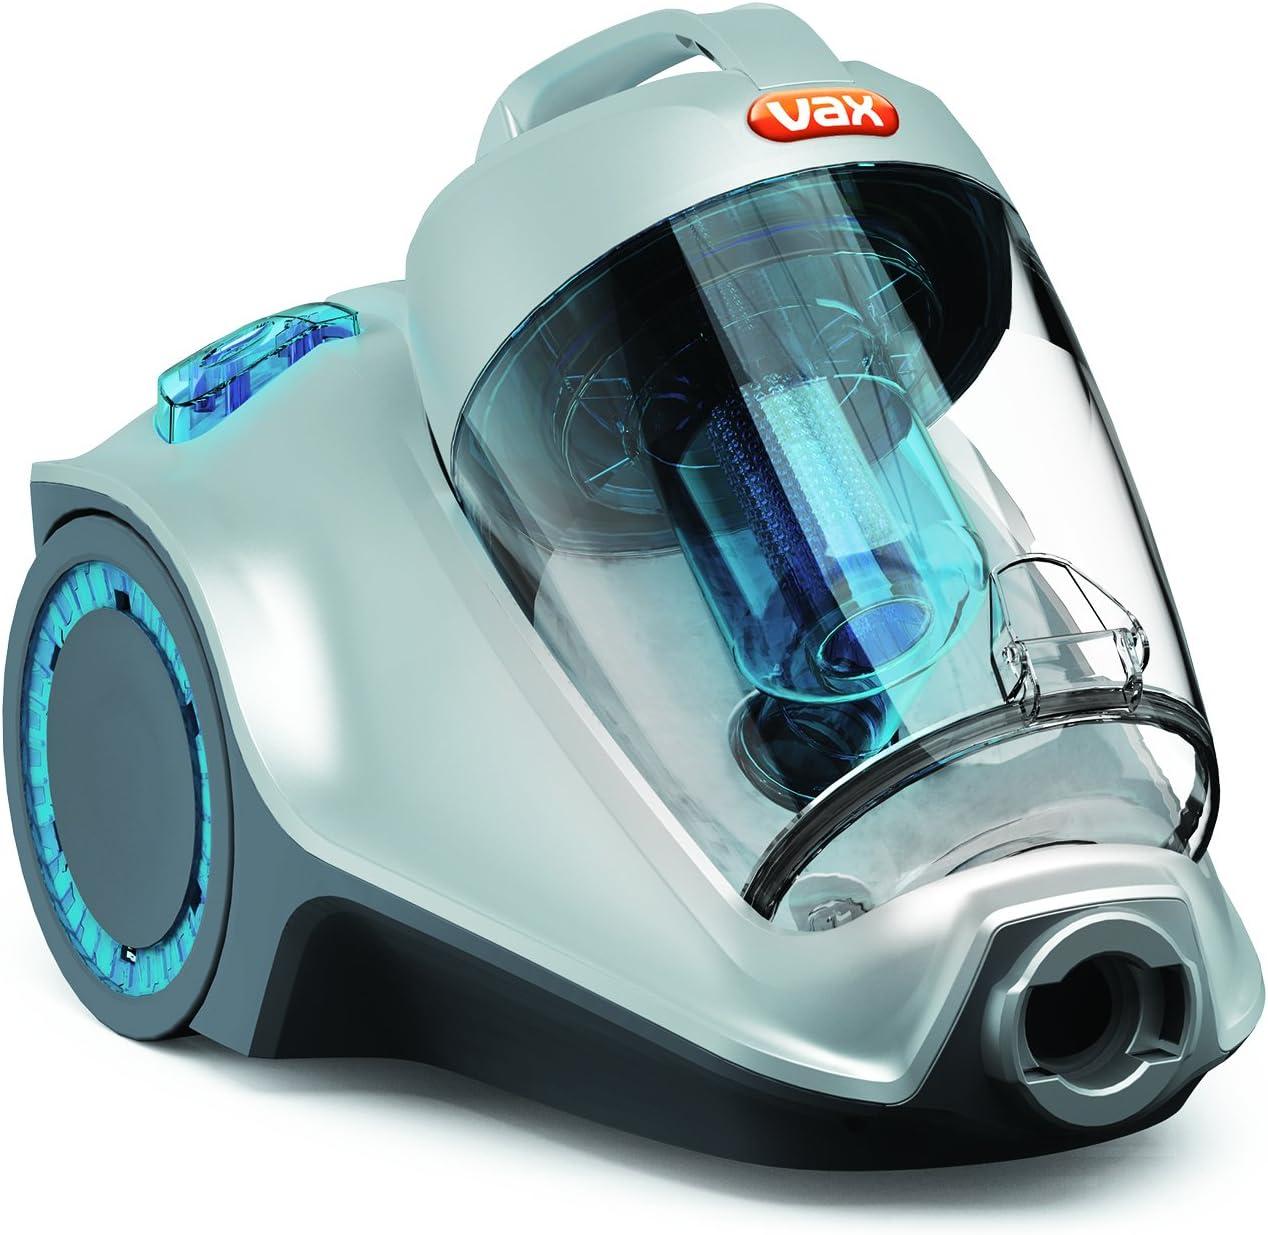 Vax Power 7 Pet Cylinder Vacuum Cleaner